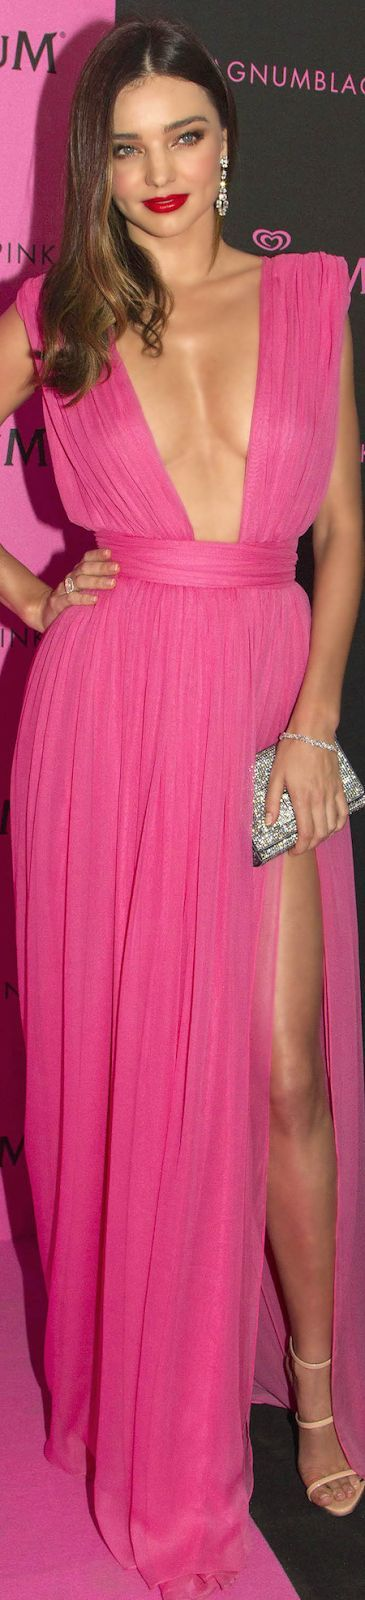 Alexa at the Society Gala (green dress)